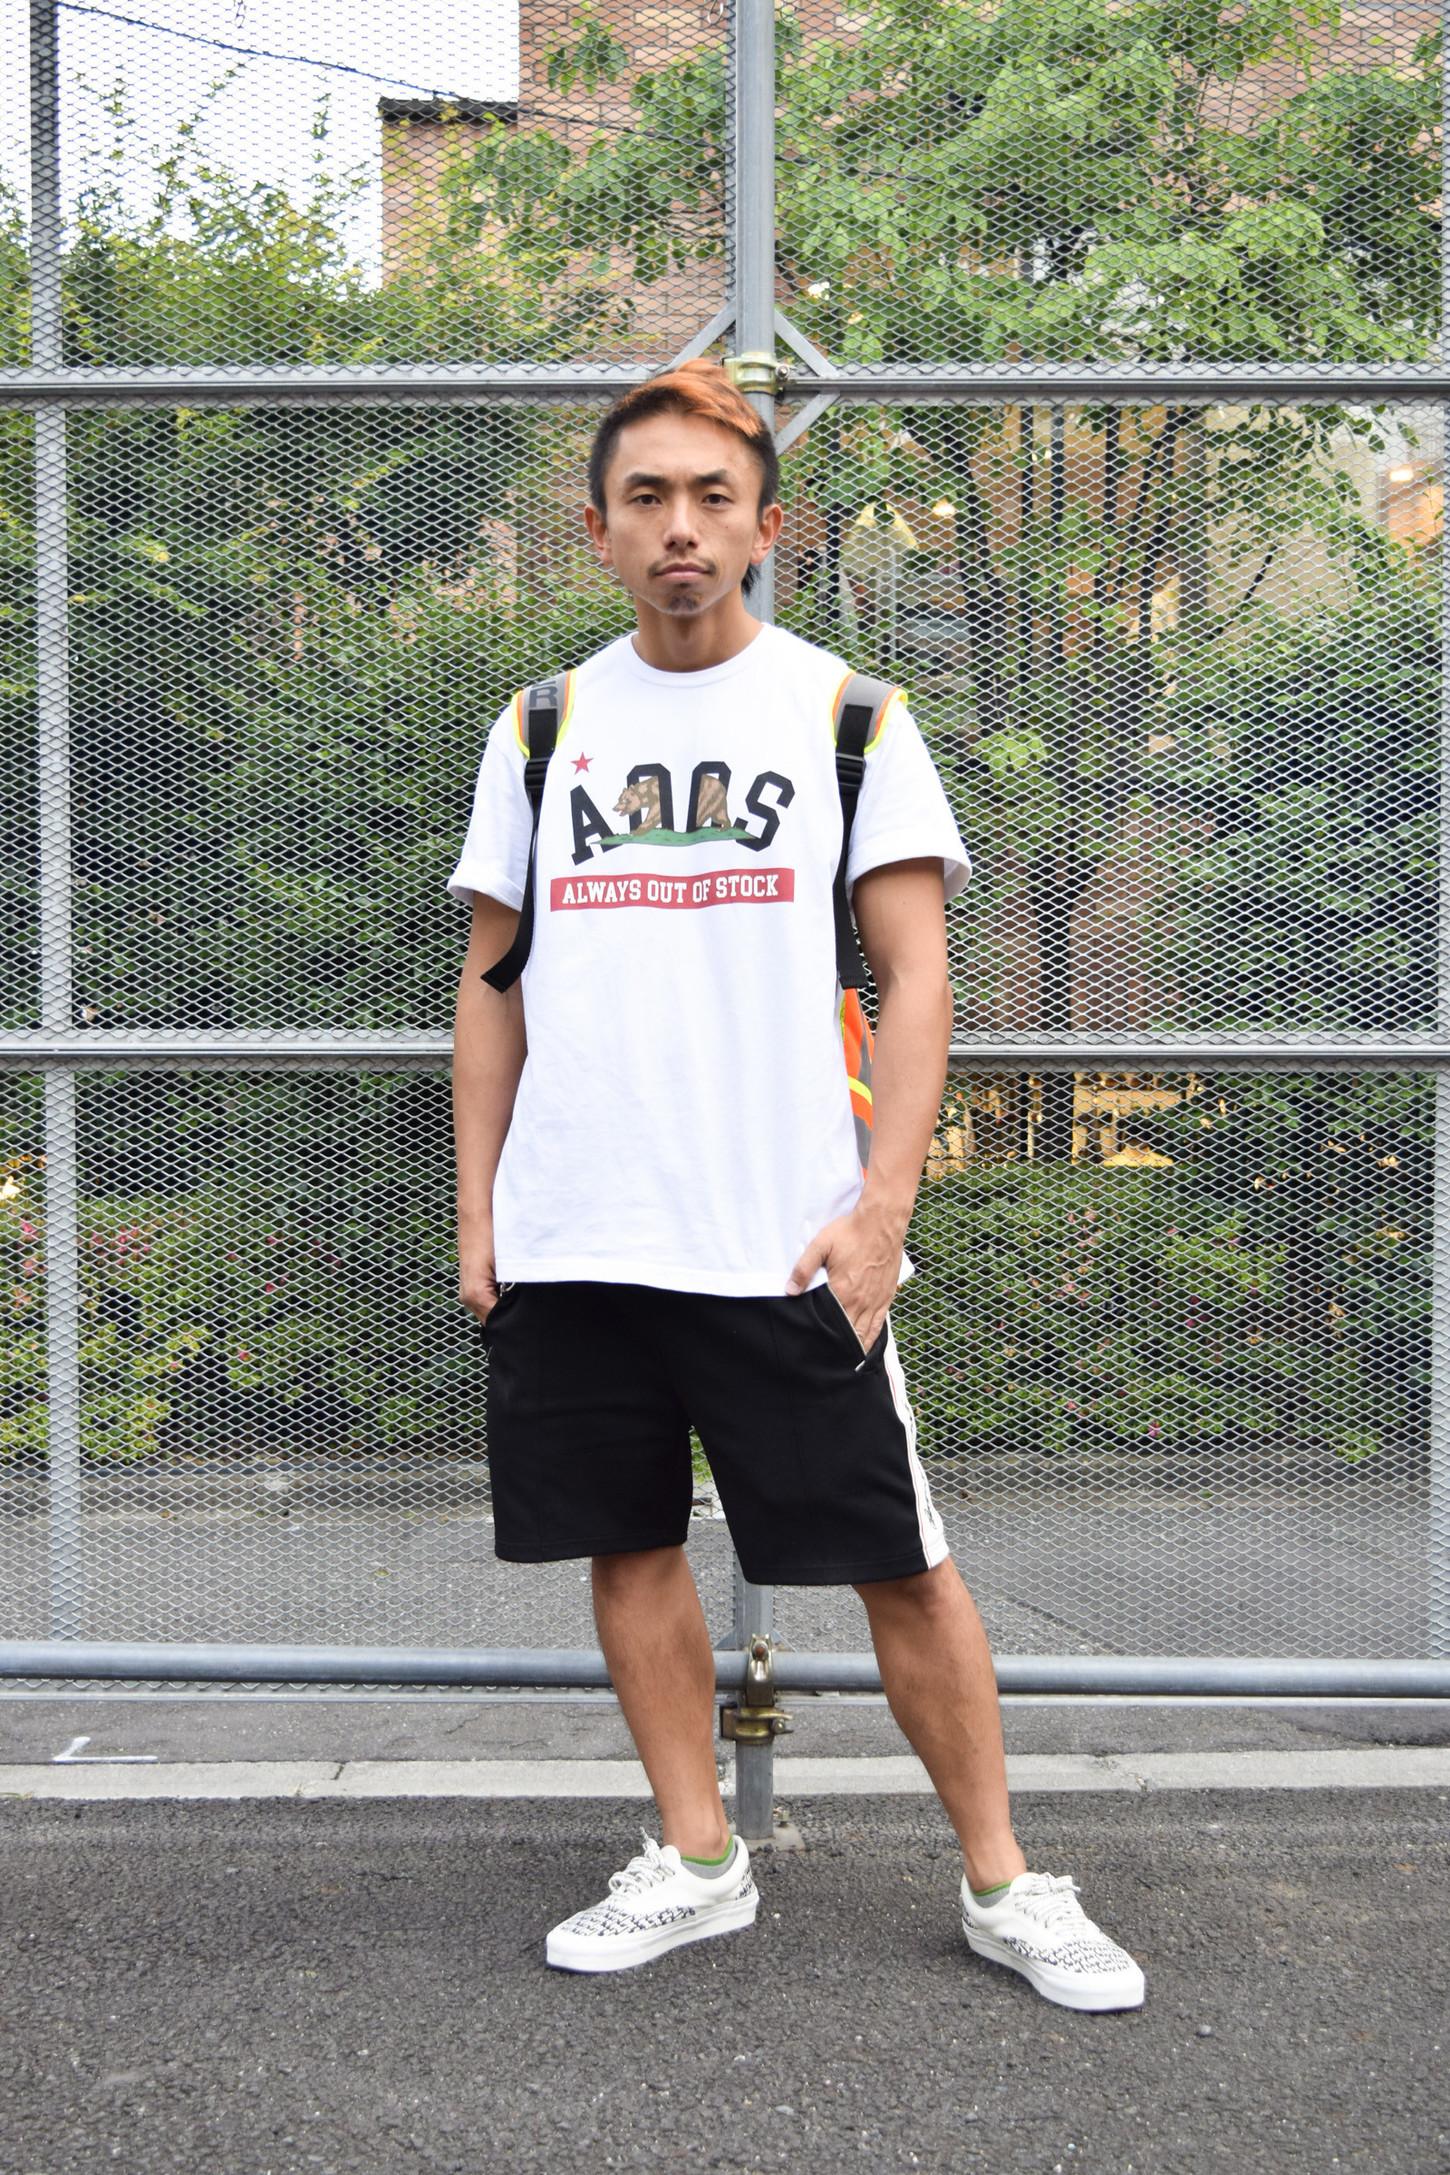 King-Masa